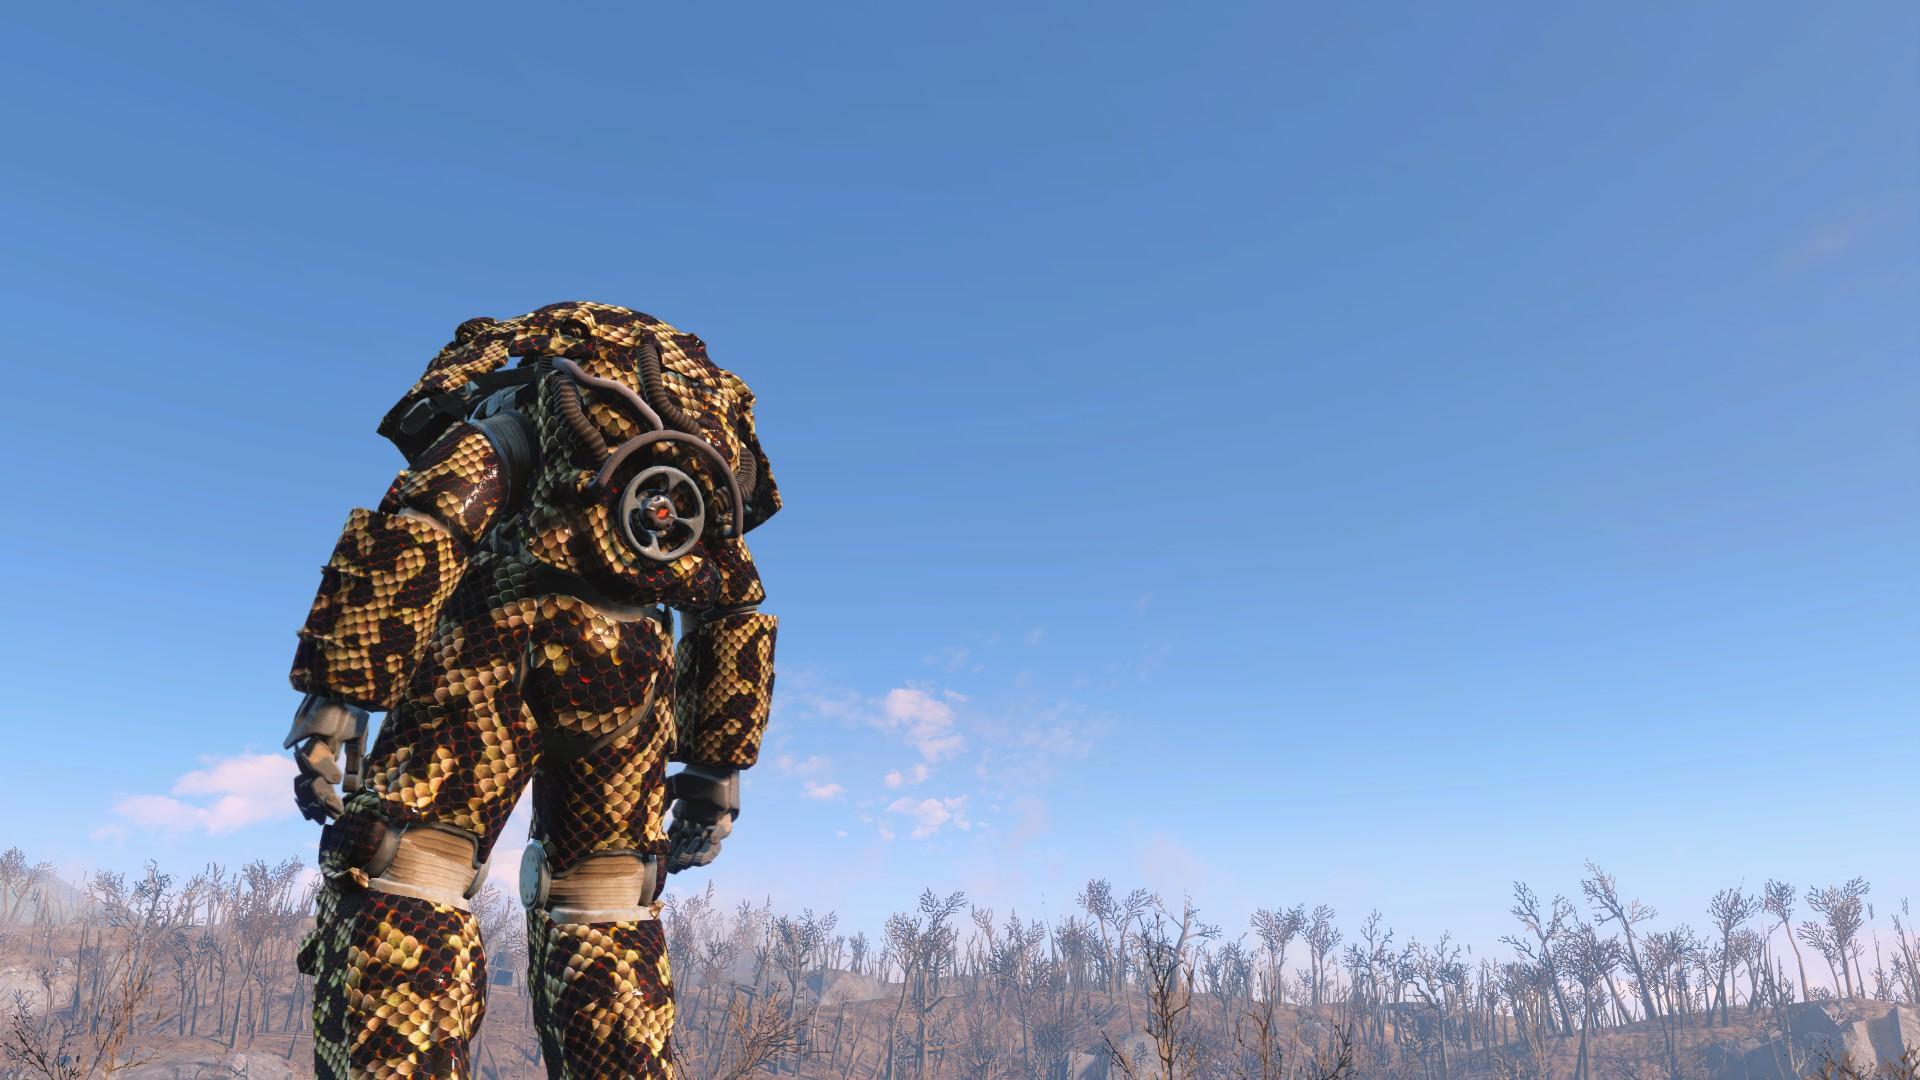 20190421201121_1.jpg - Fallout 4